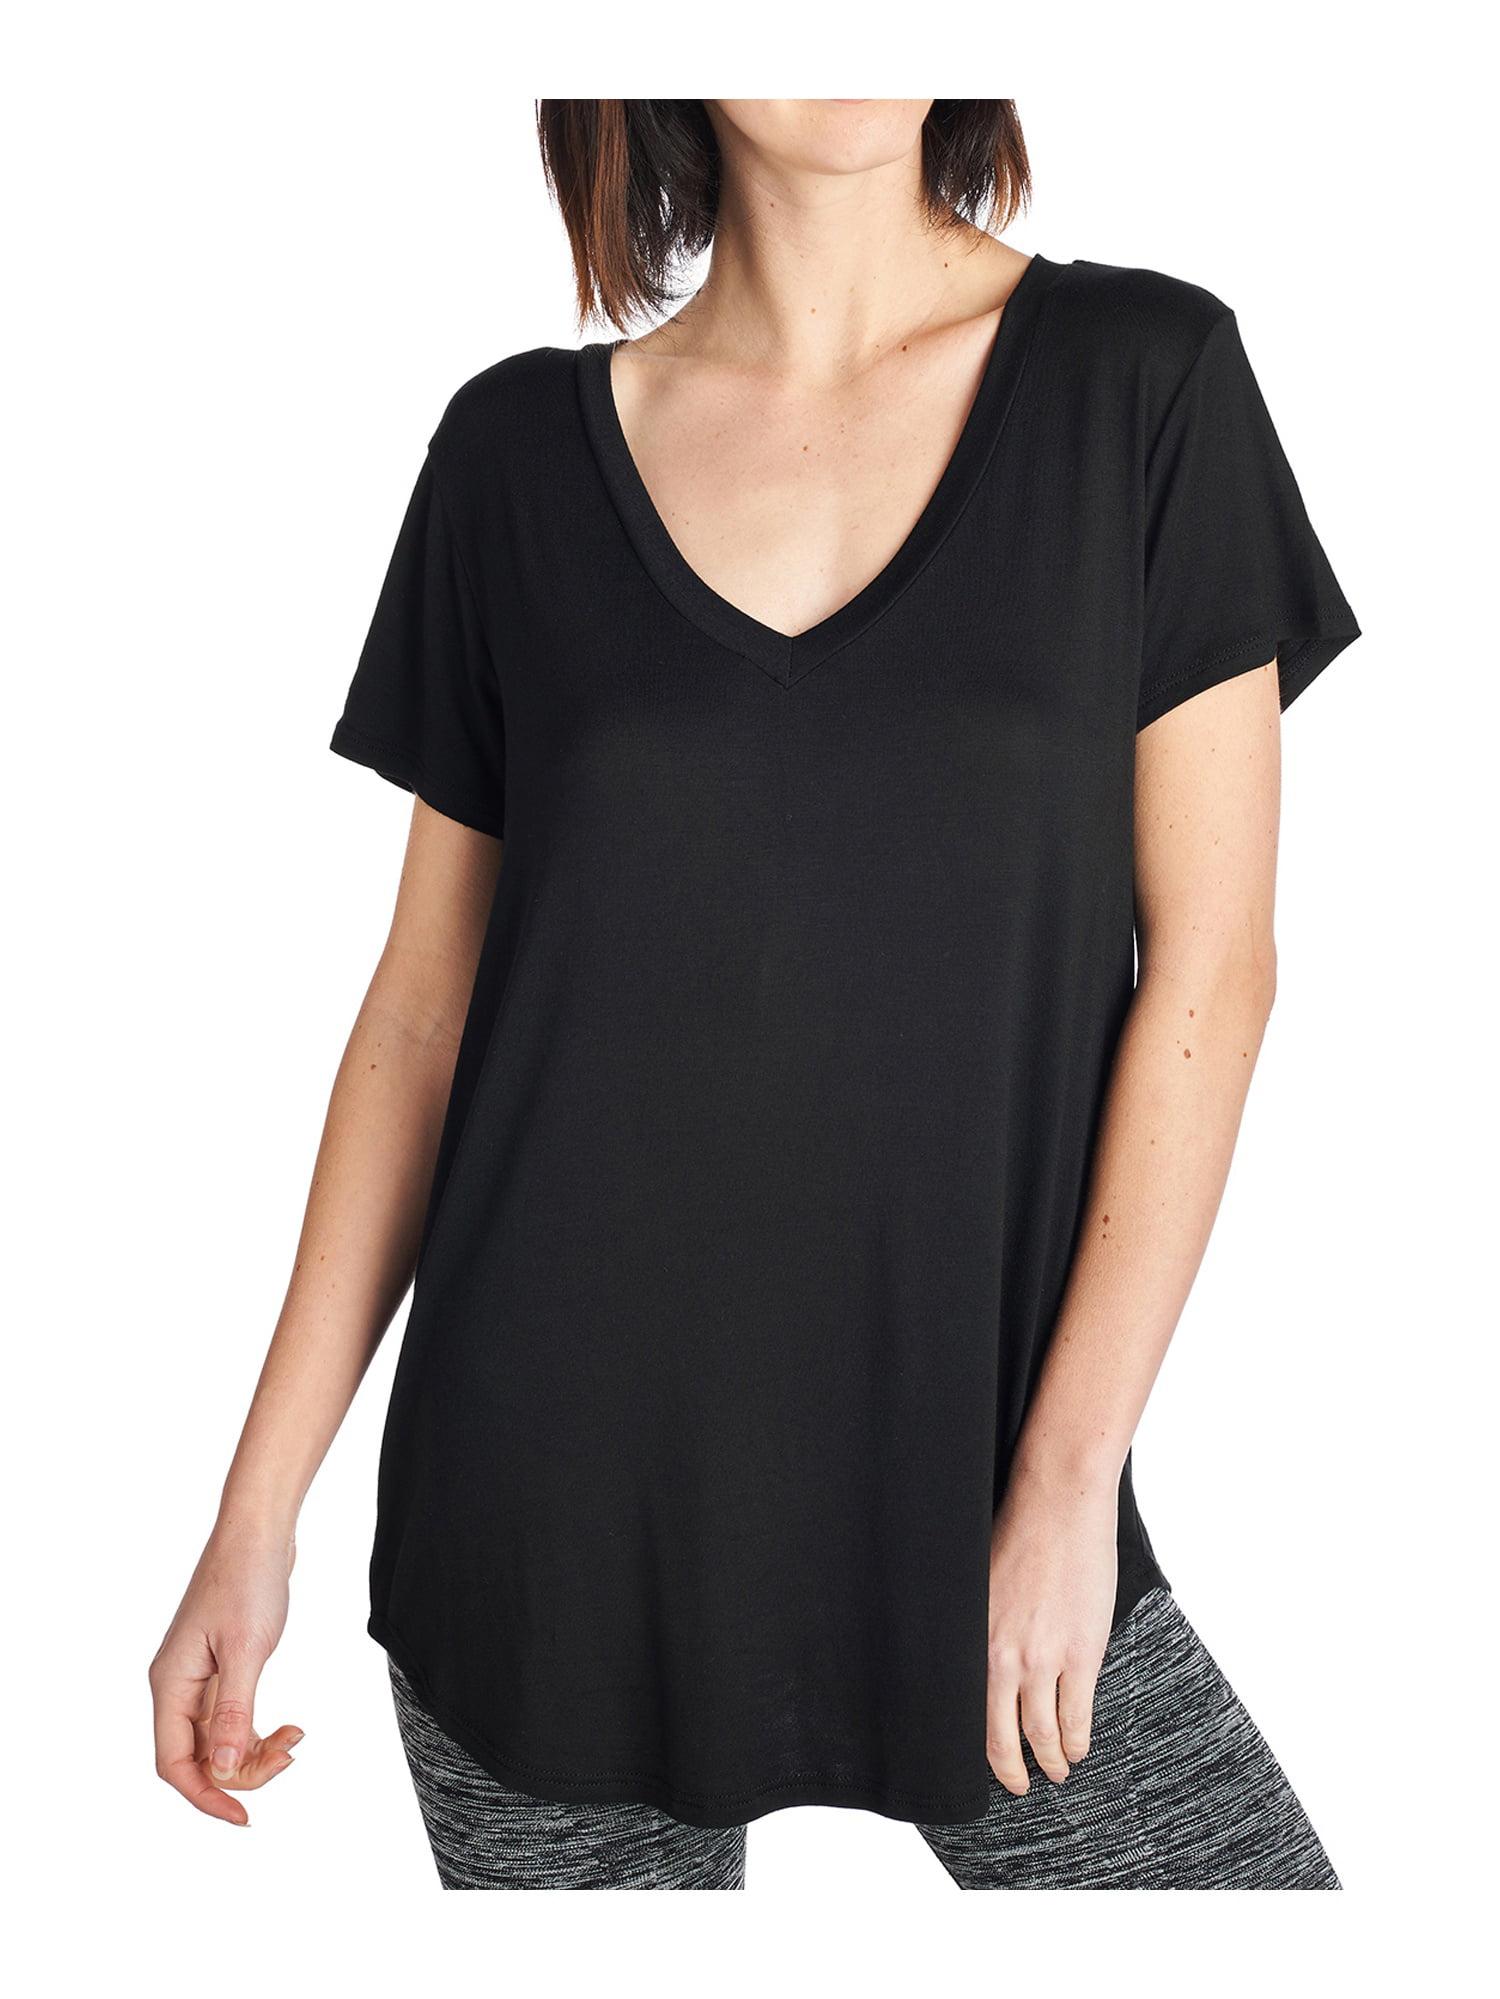 Tough Cookie/'s Women/'s Plain Silky Loose Fit V-neck Top